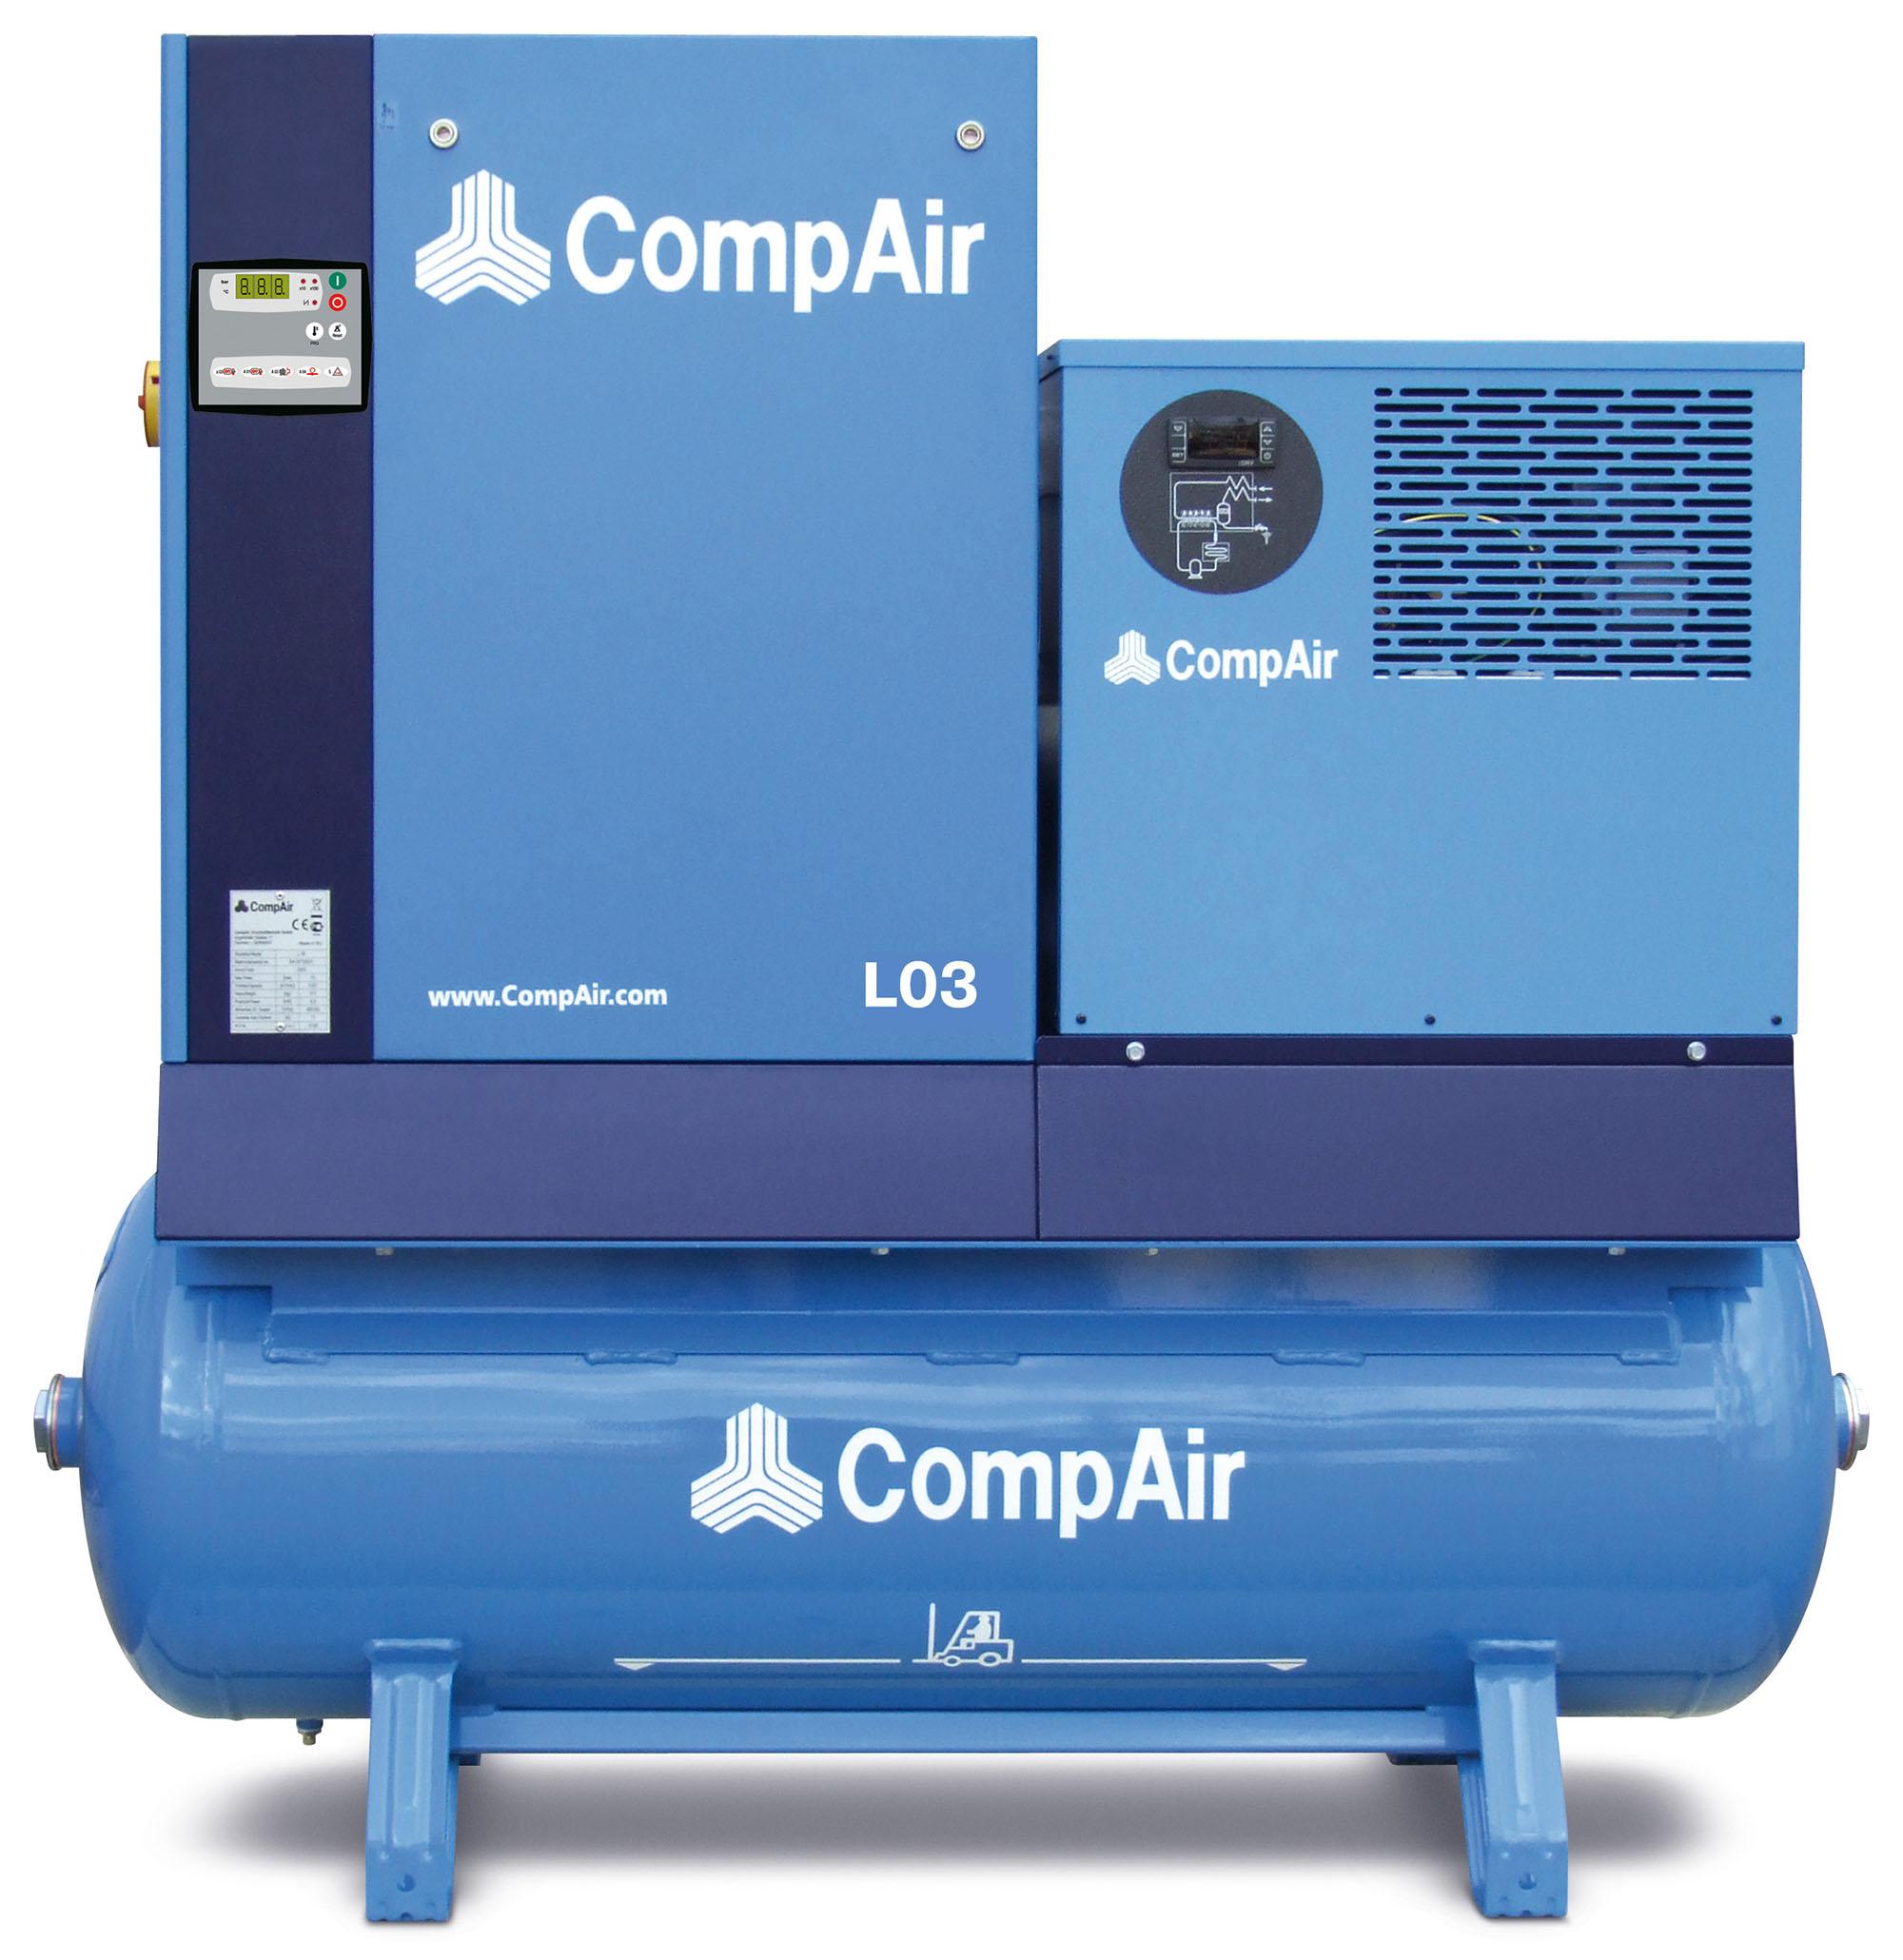 Midlands UK supplier of CompAir L03FS air compressor